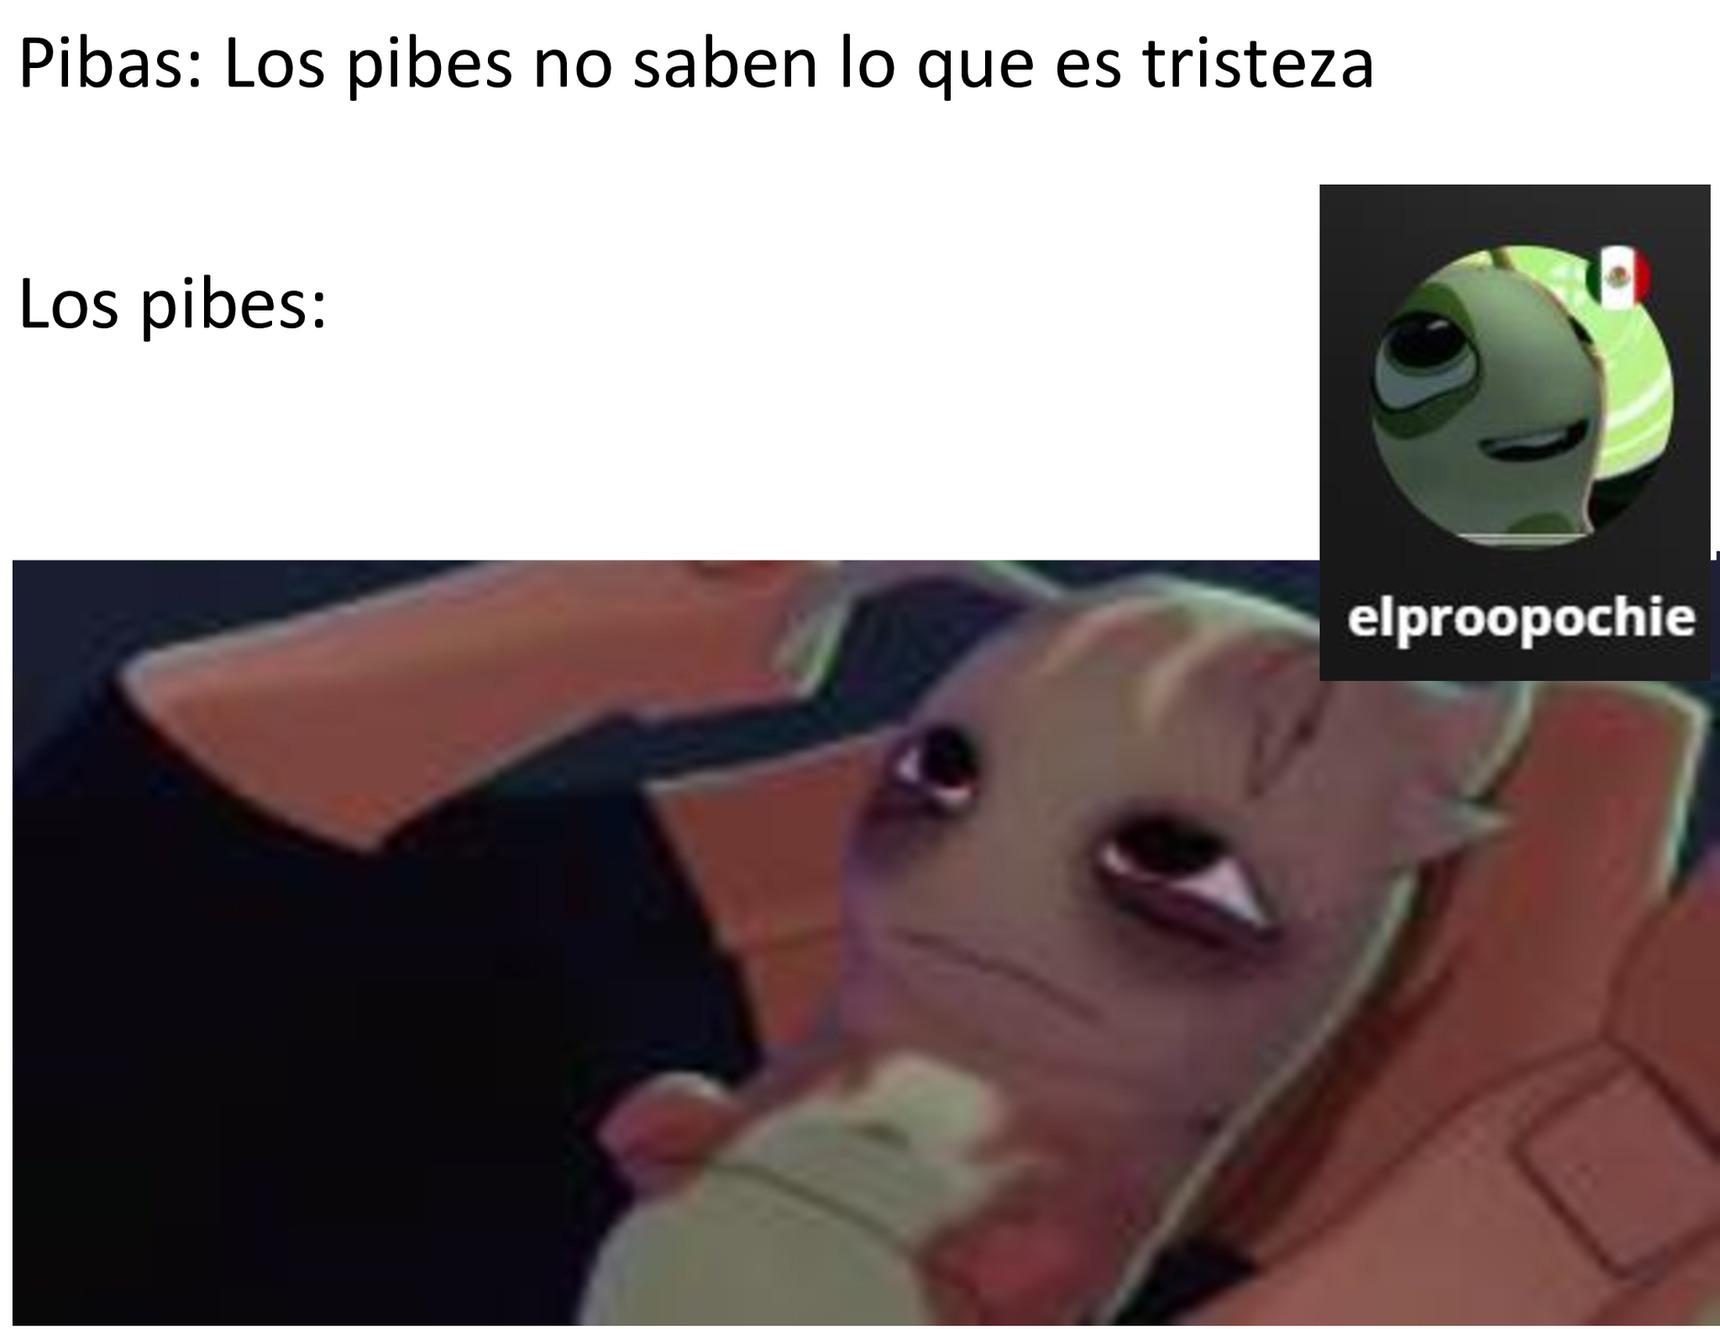 re triste - meme